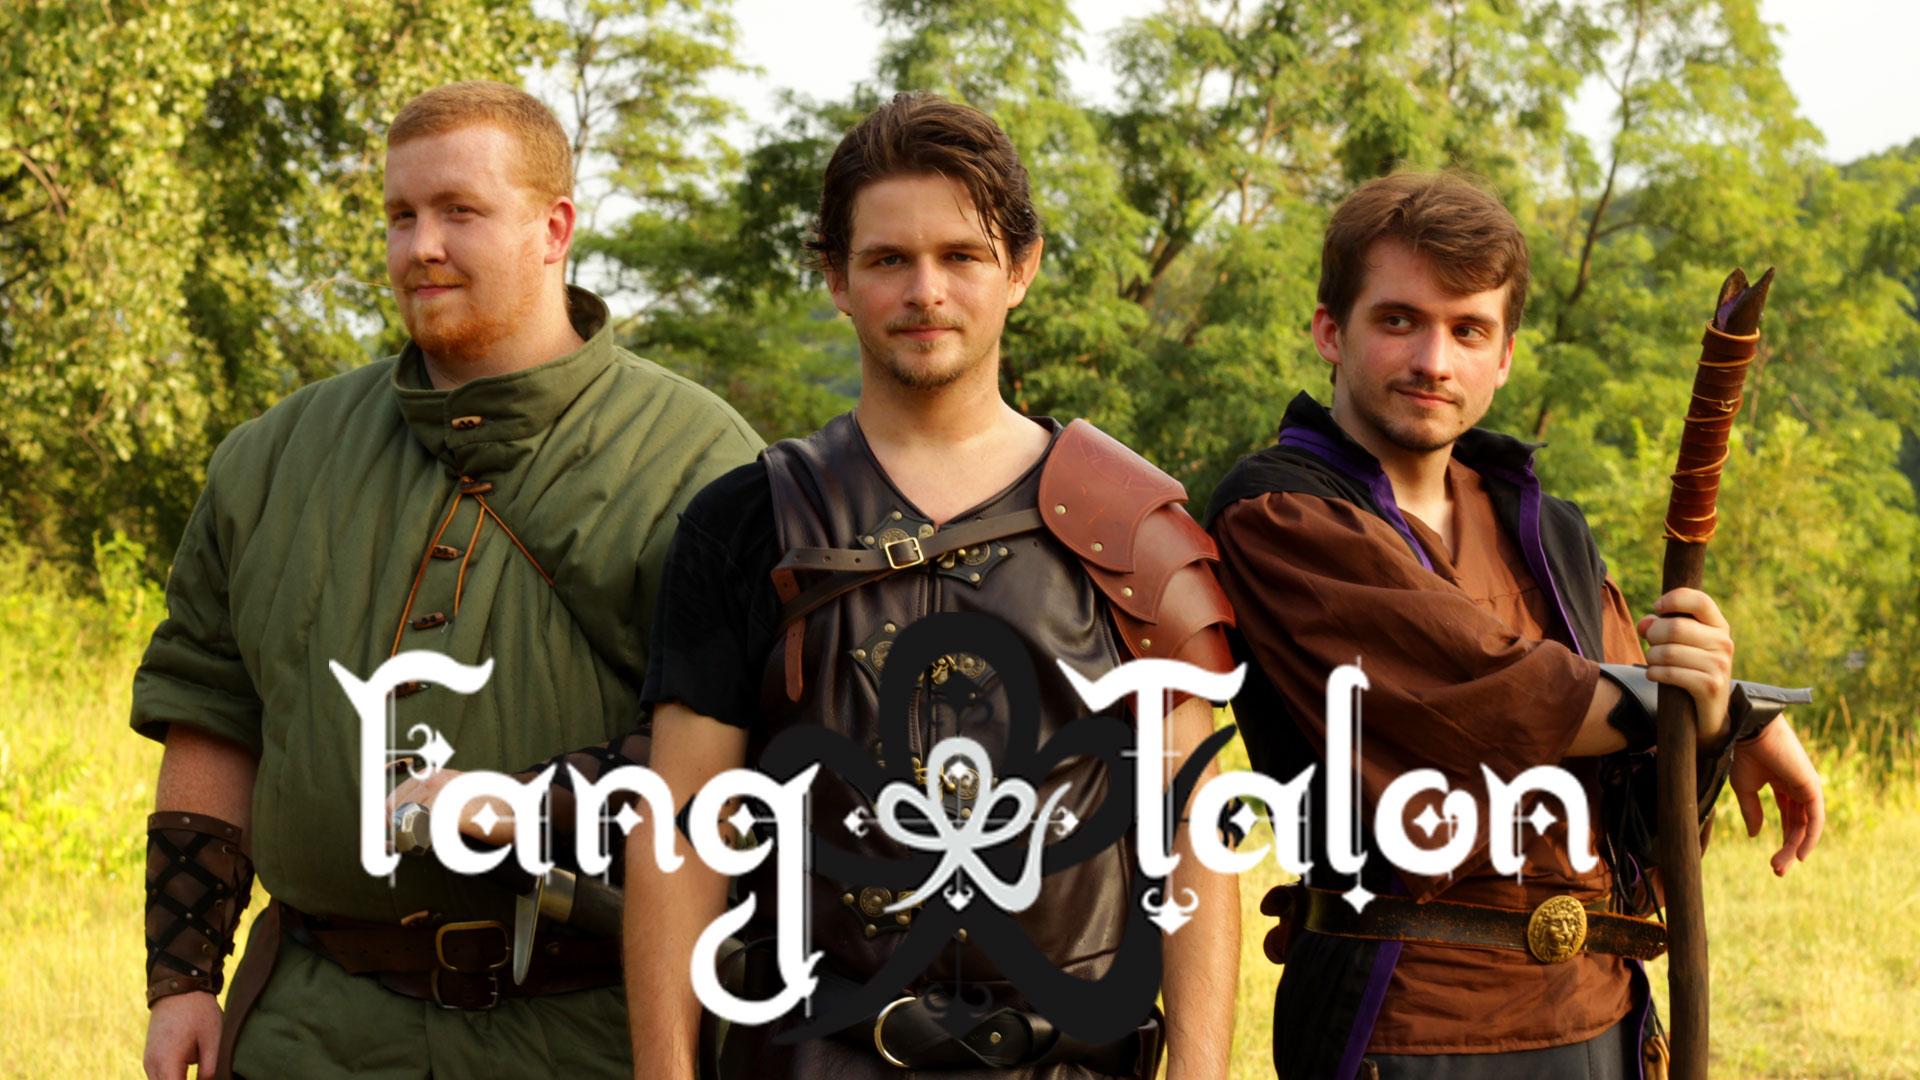 Fang & Talon